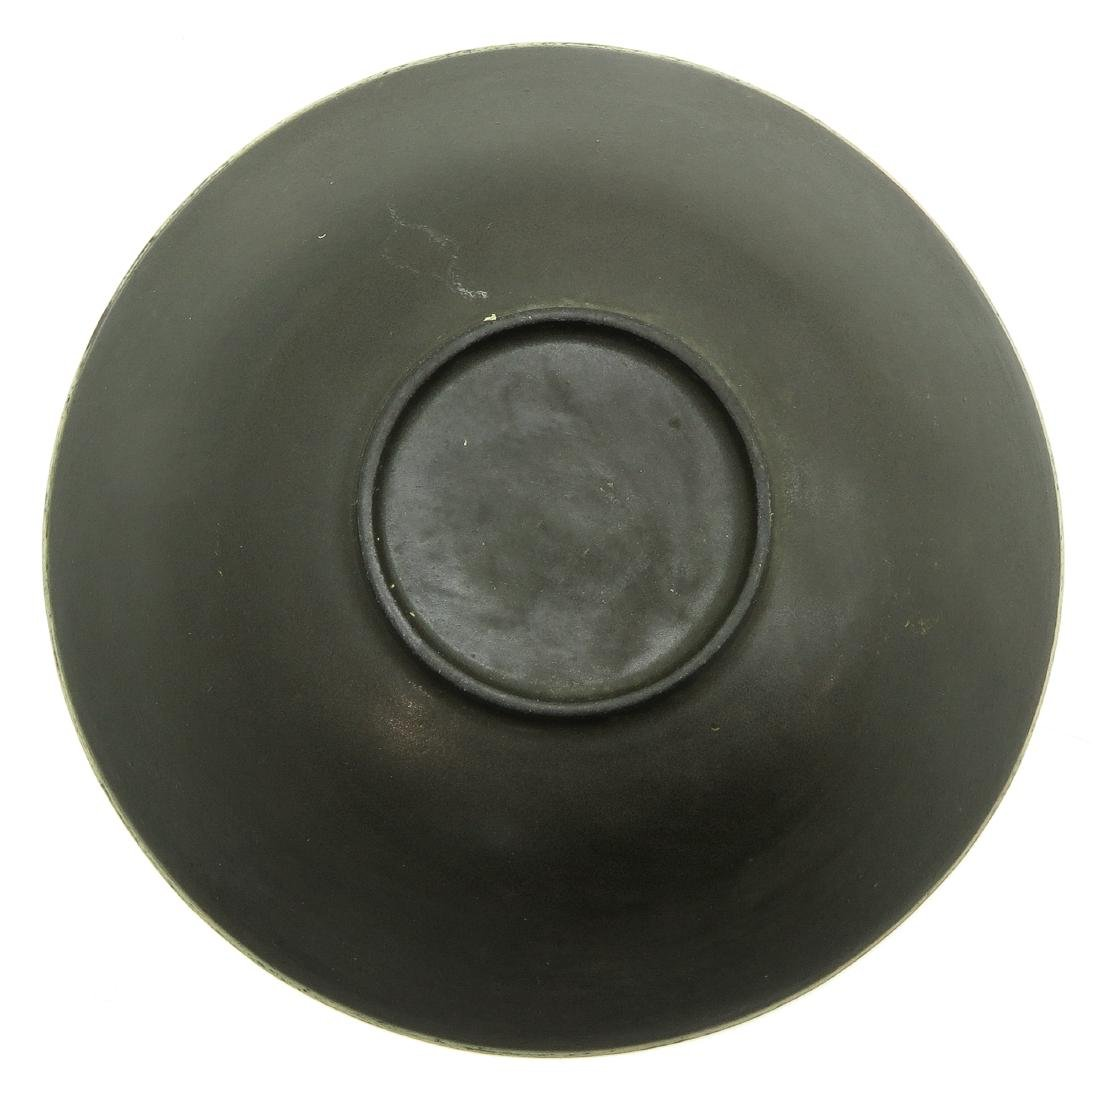 Bowl - 2